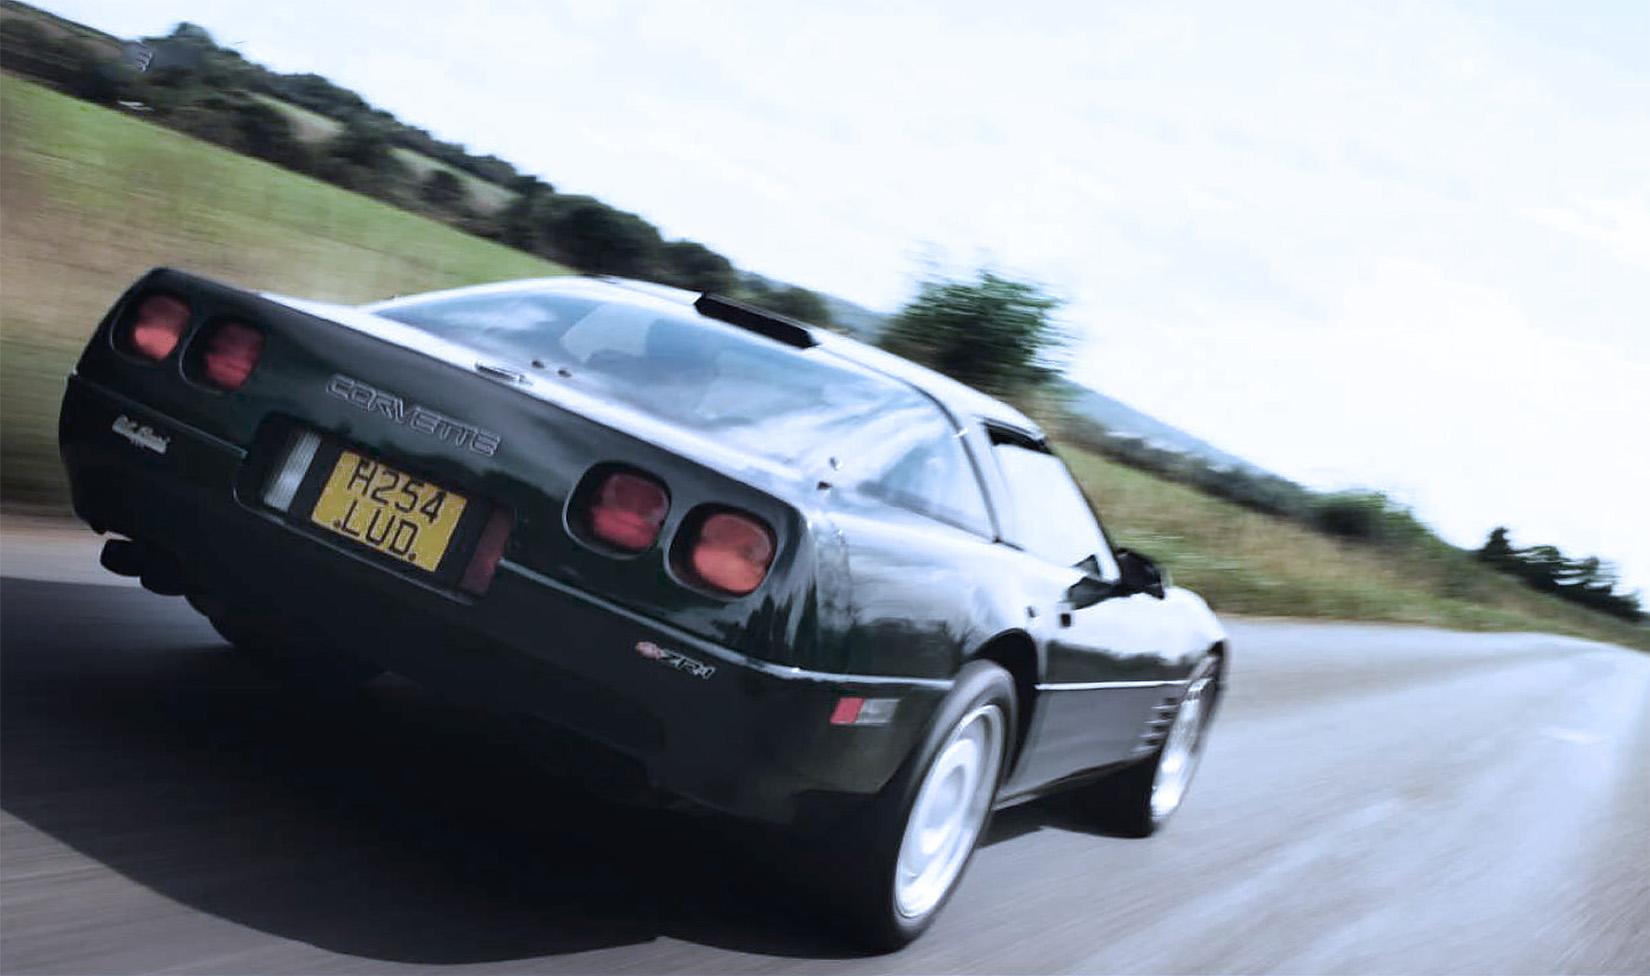 1991 Chevrolet Corvette ZR-1 C4 road test